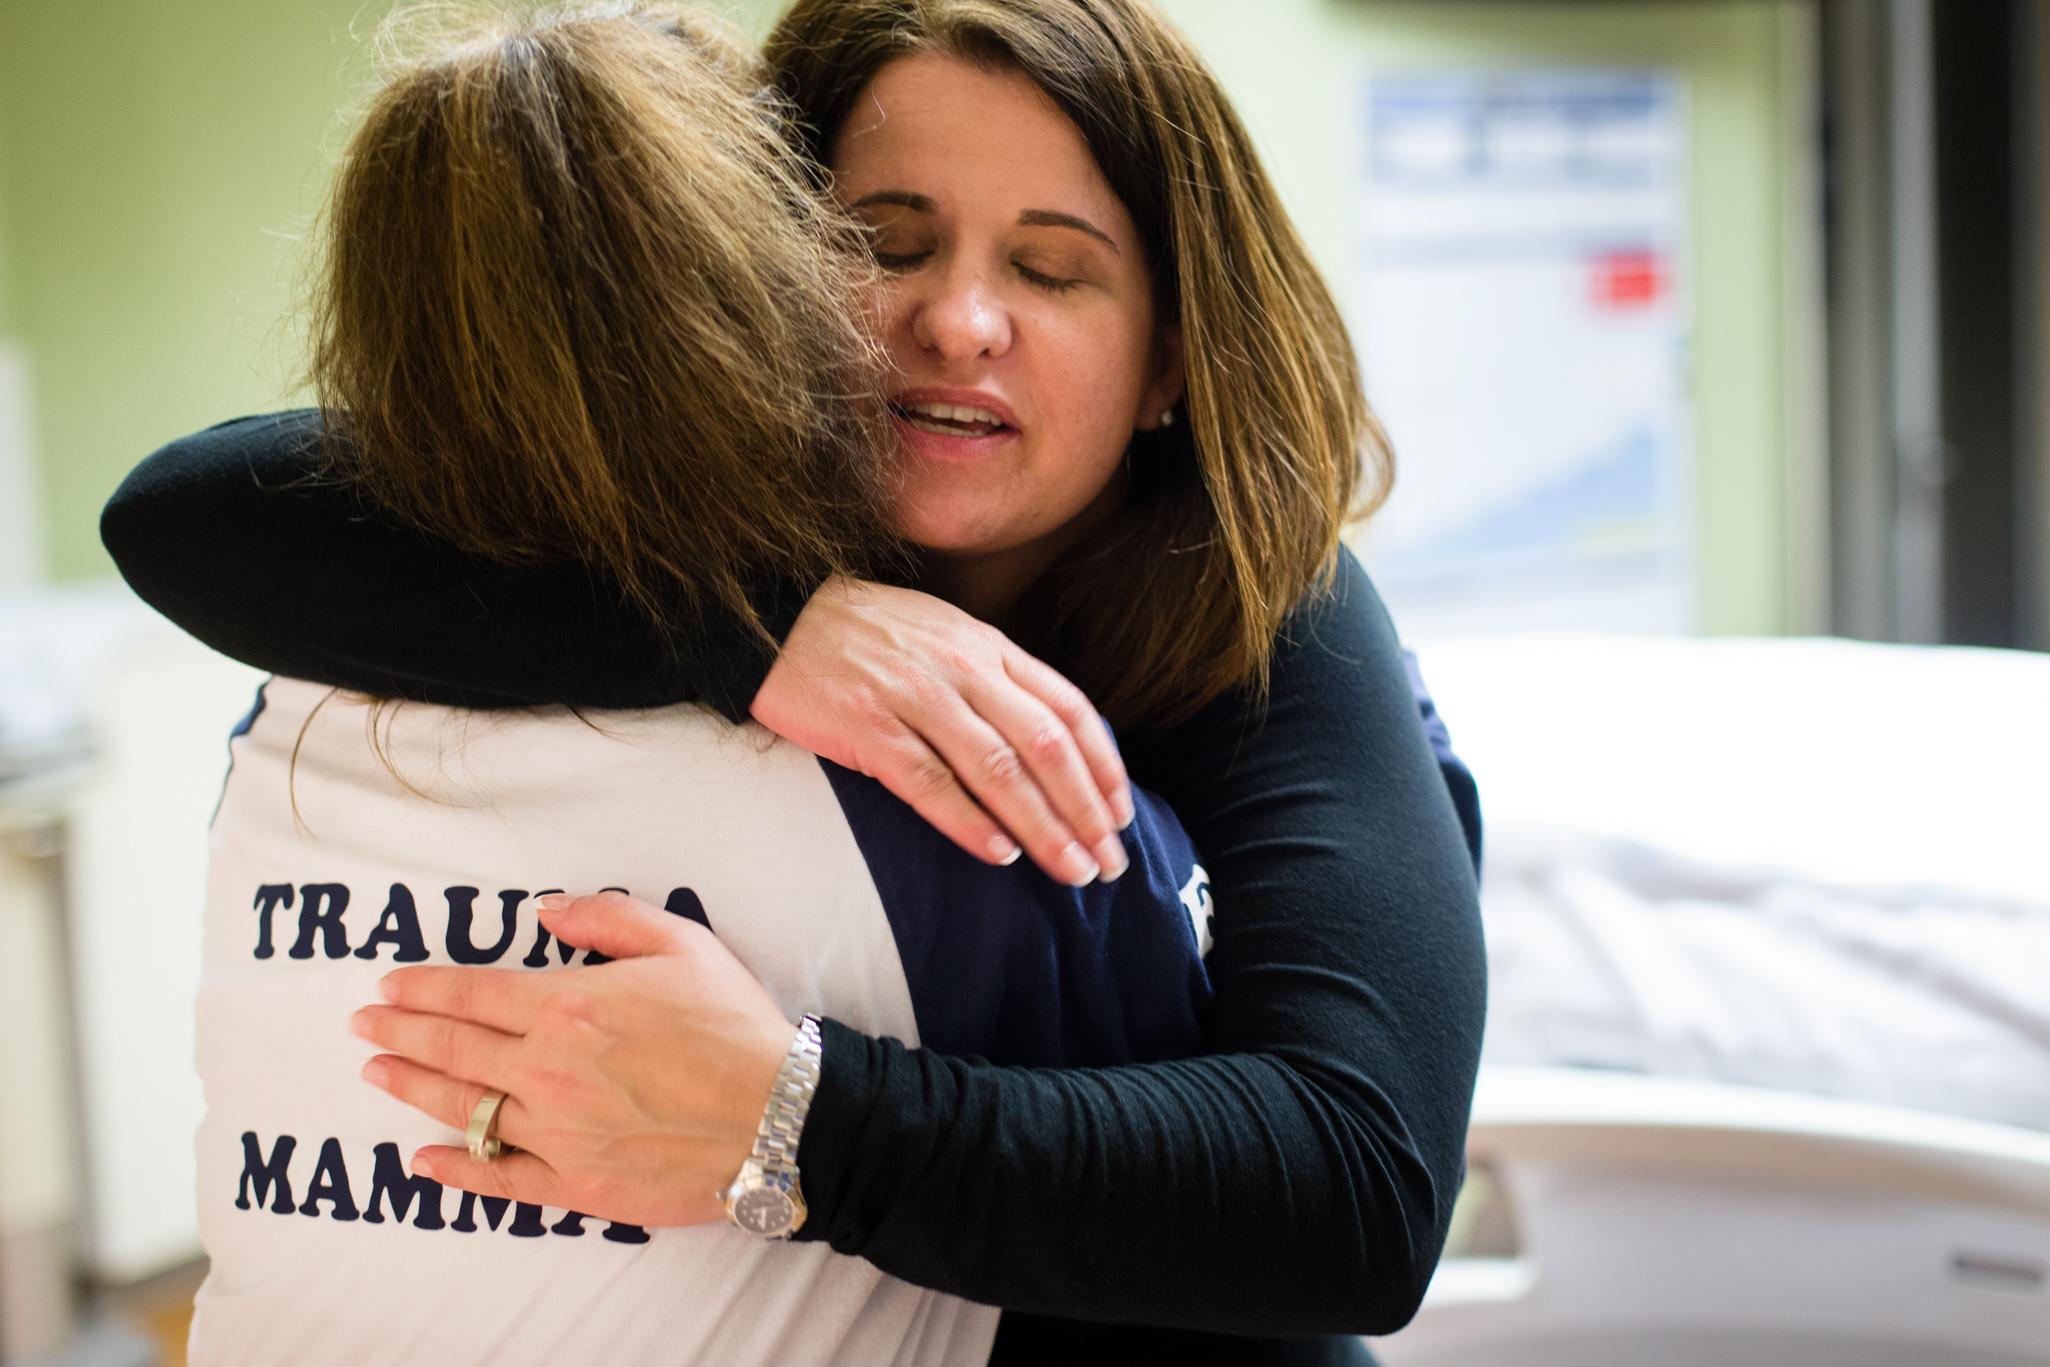 Parker hugs fellow nurse Karyn McComb whose shirt reads,  Trauma Mamma .